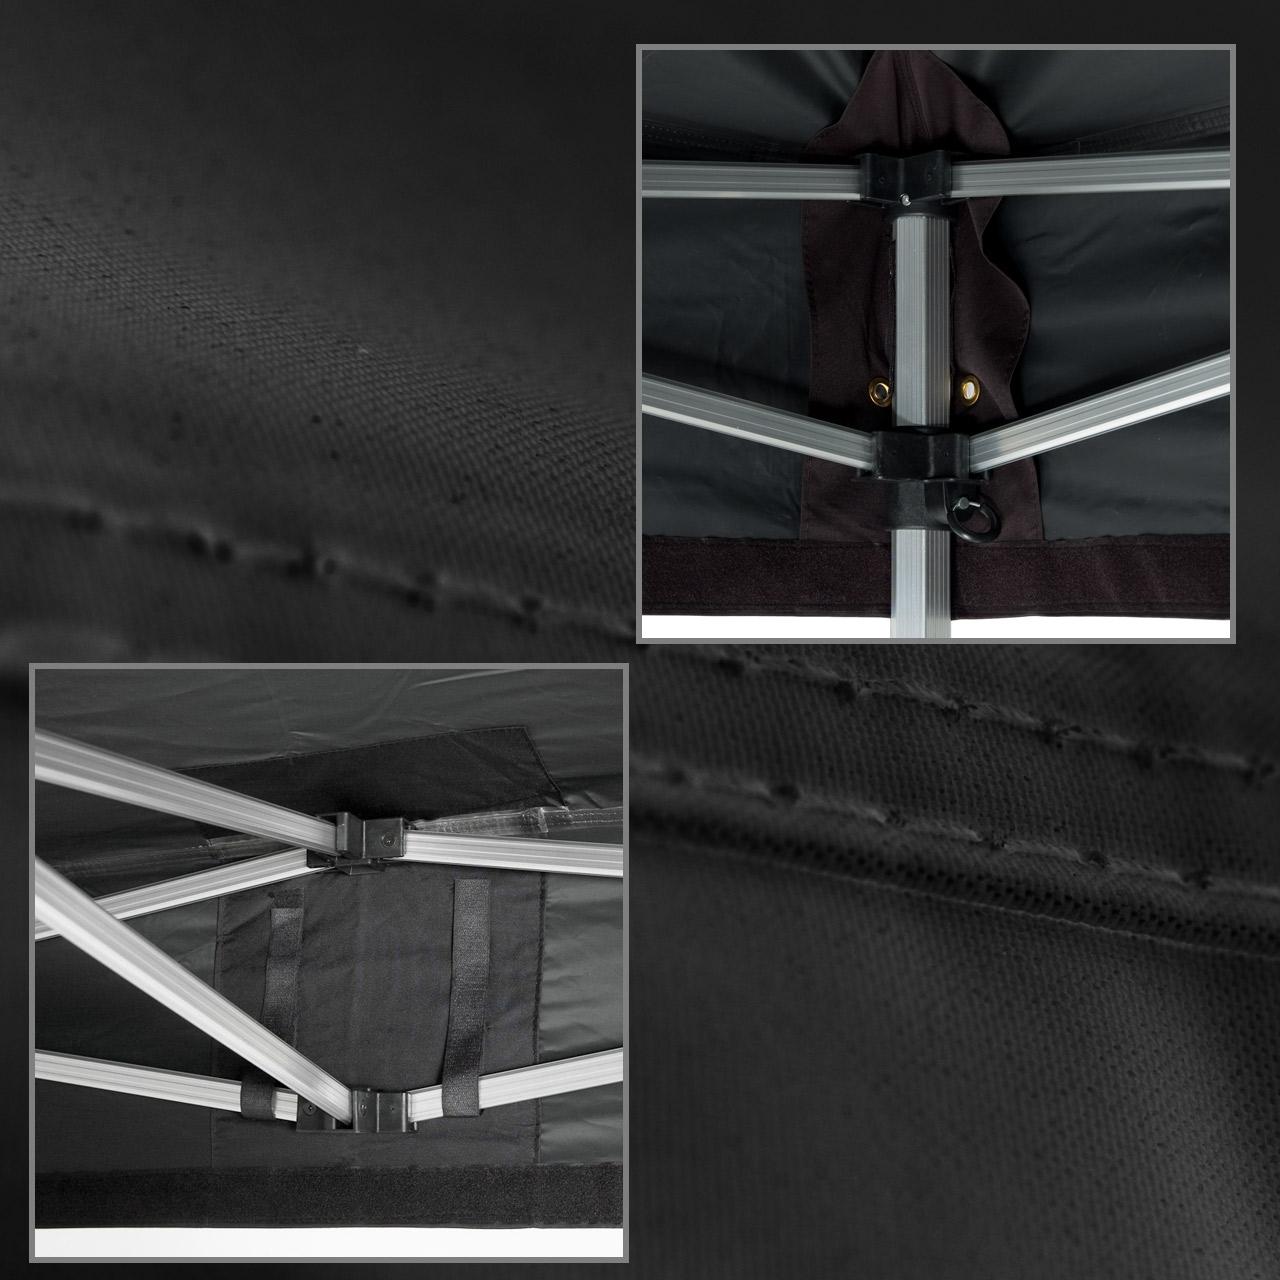 Profifaltpavillon-Plane-schwarz58b65616a0083